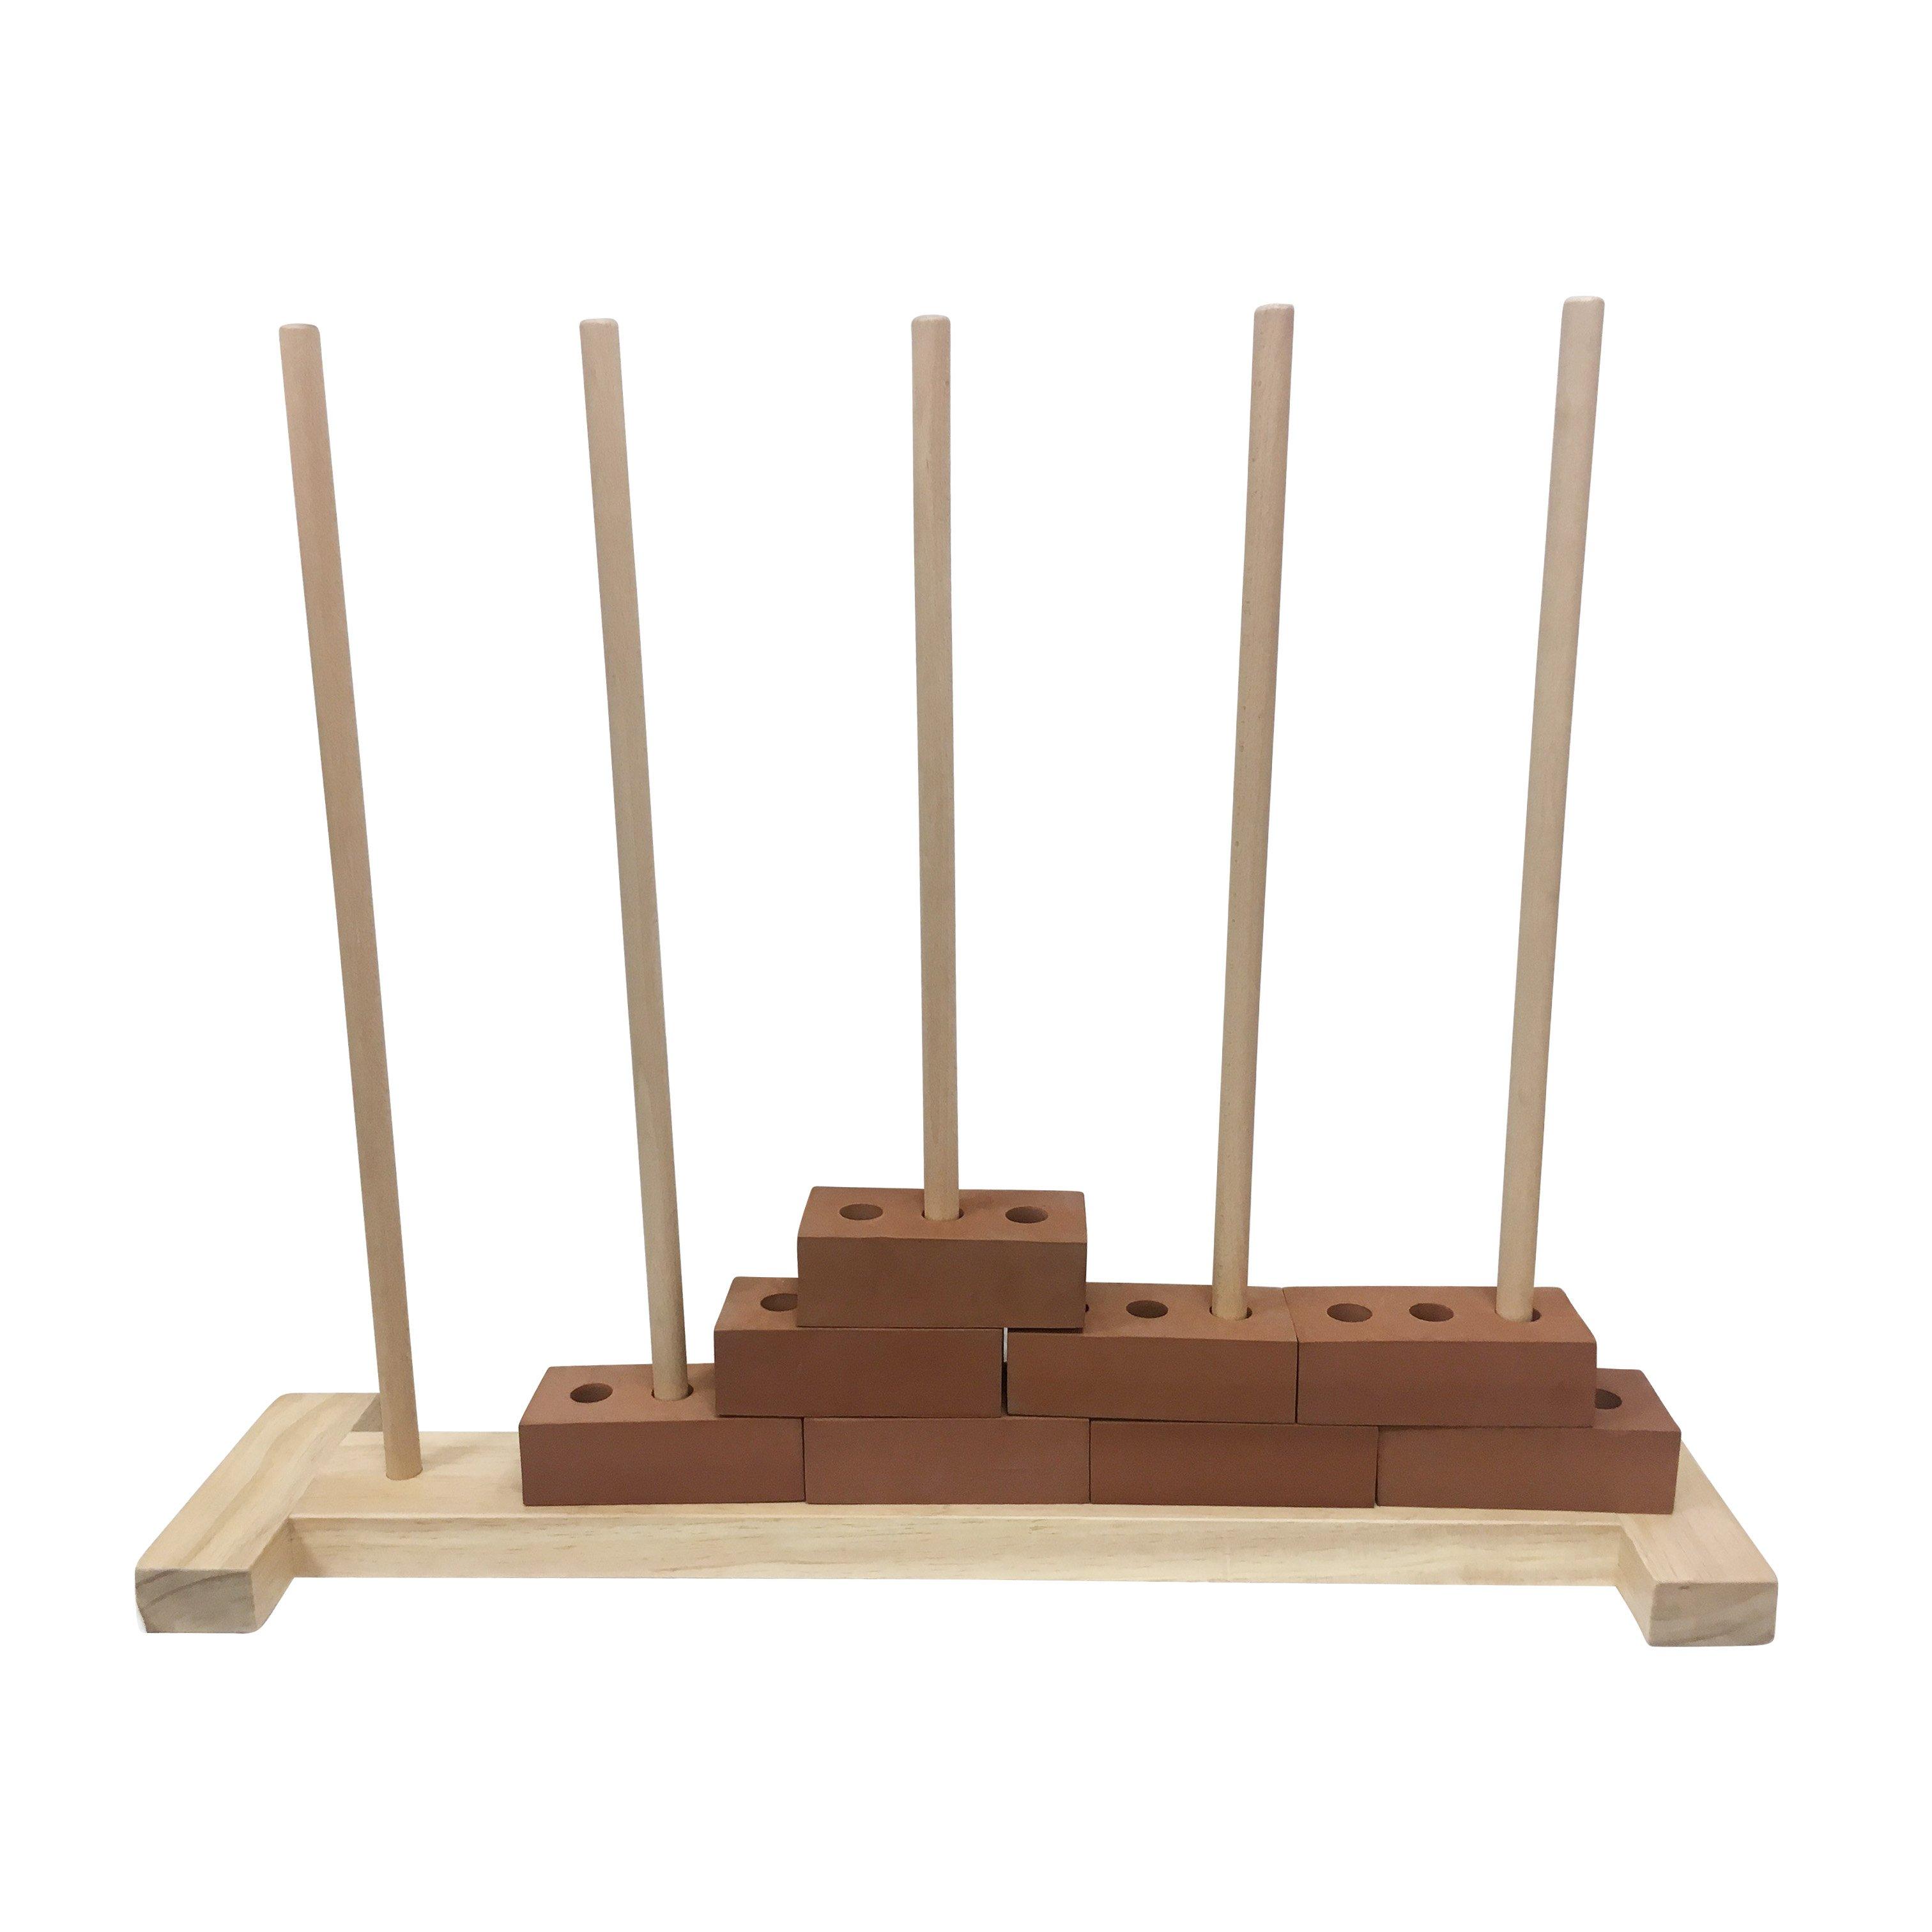 SYWS1 Foam Brick Wooden Stand b copy